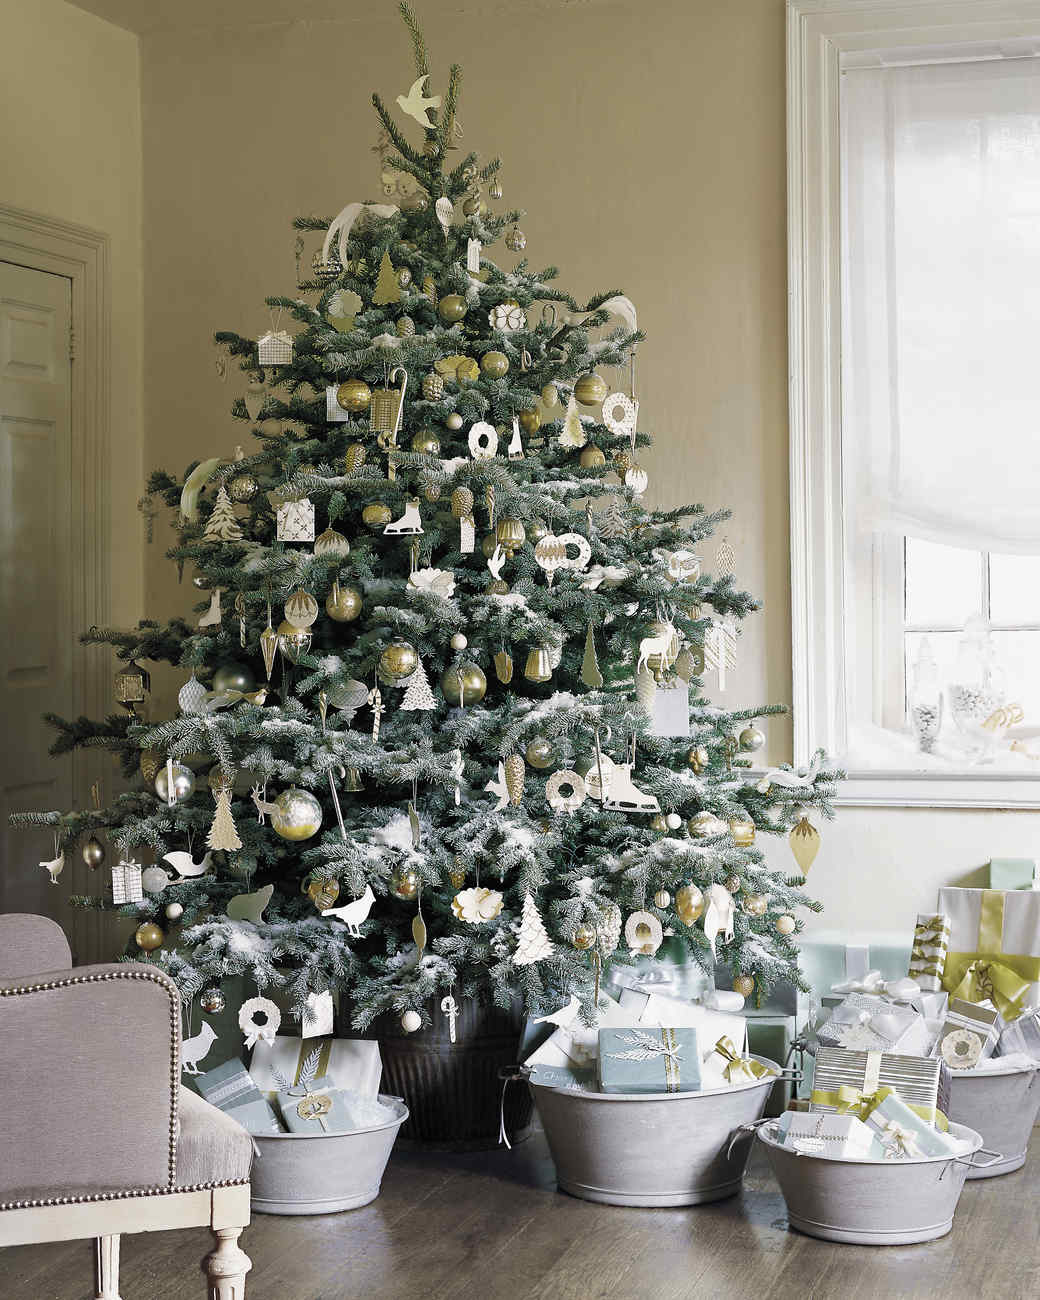 25 Creative Christmas Tree Decorating Ideas | Martha Stewart